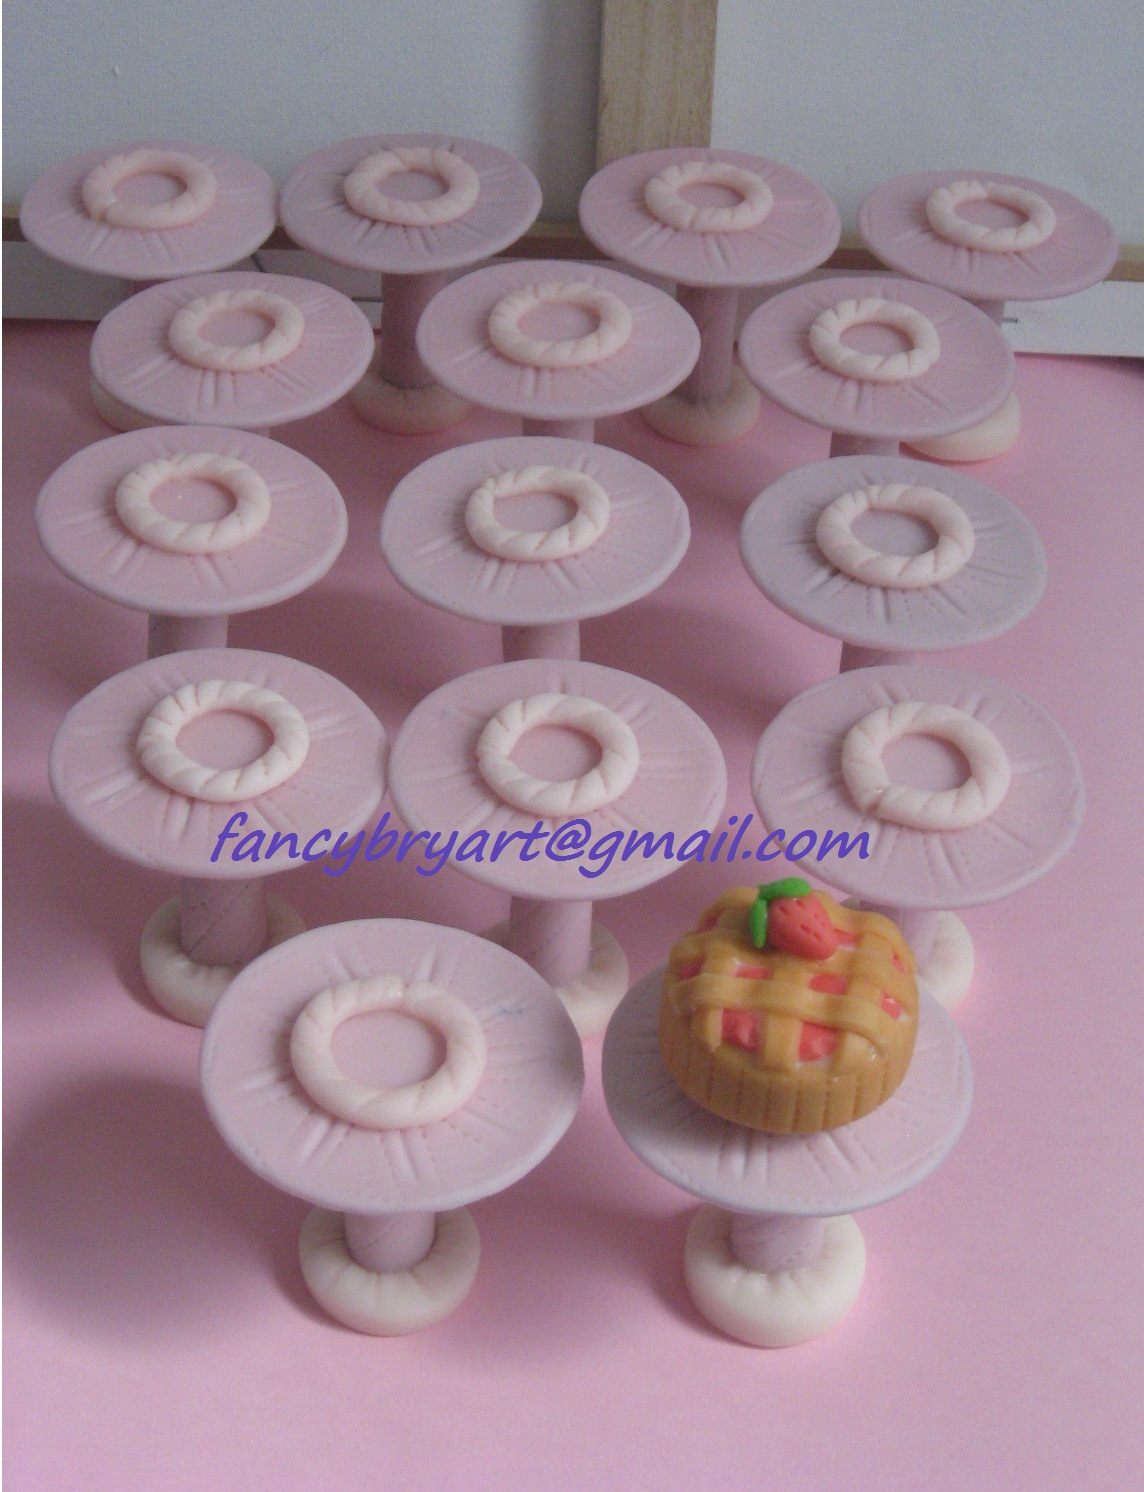 FancyBry Art: Alzatine segnatavoli: nuovi dolci